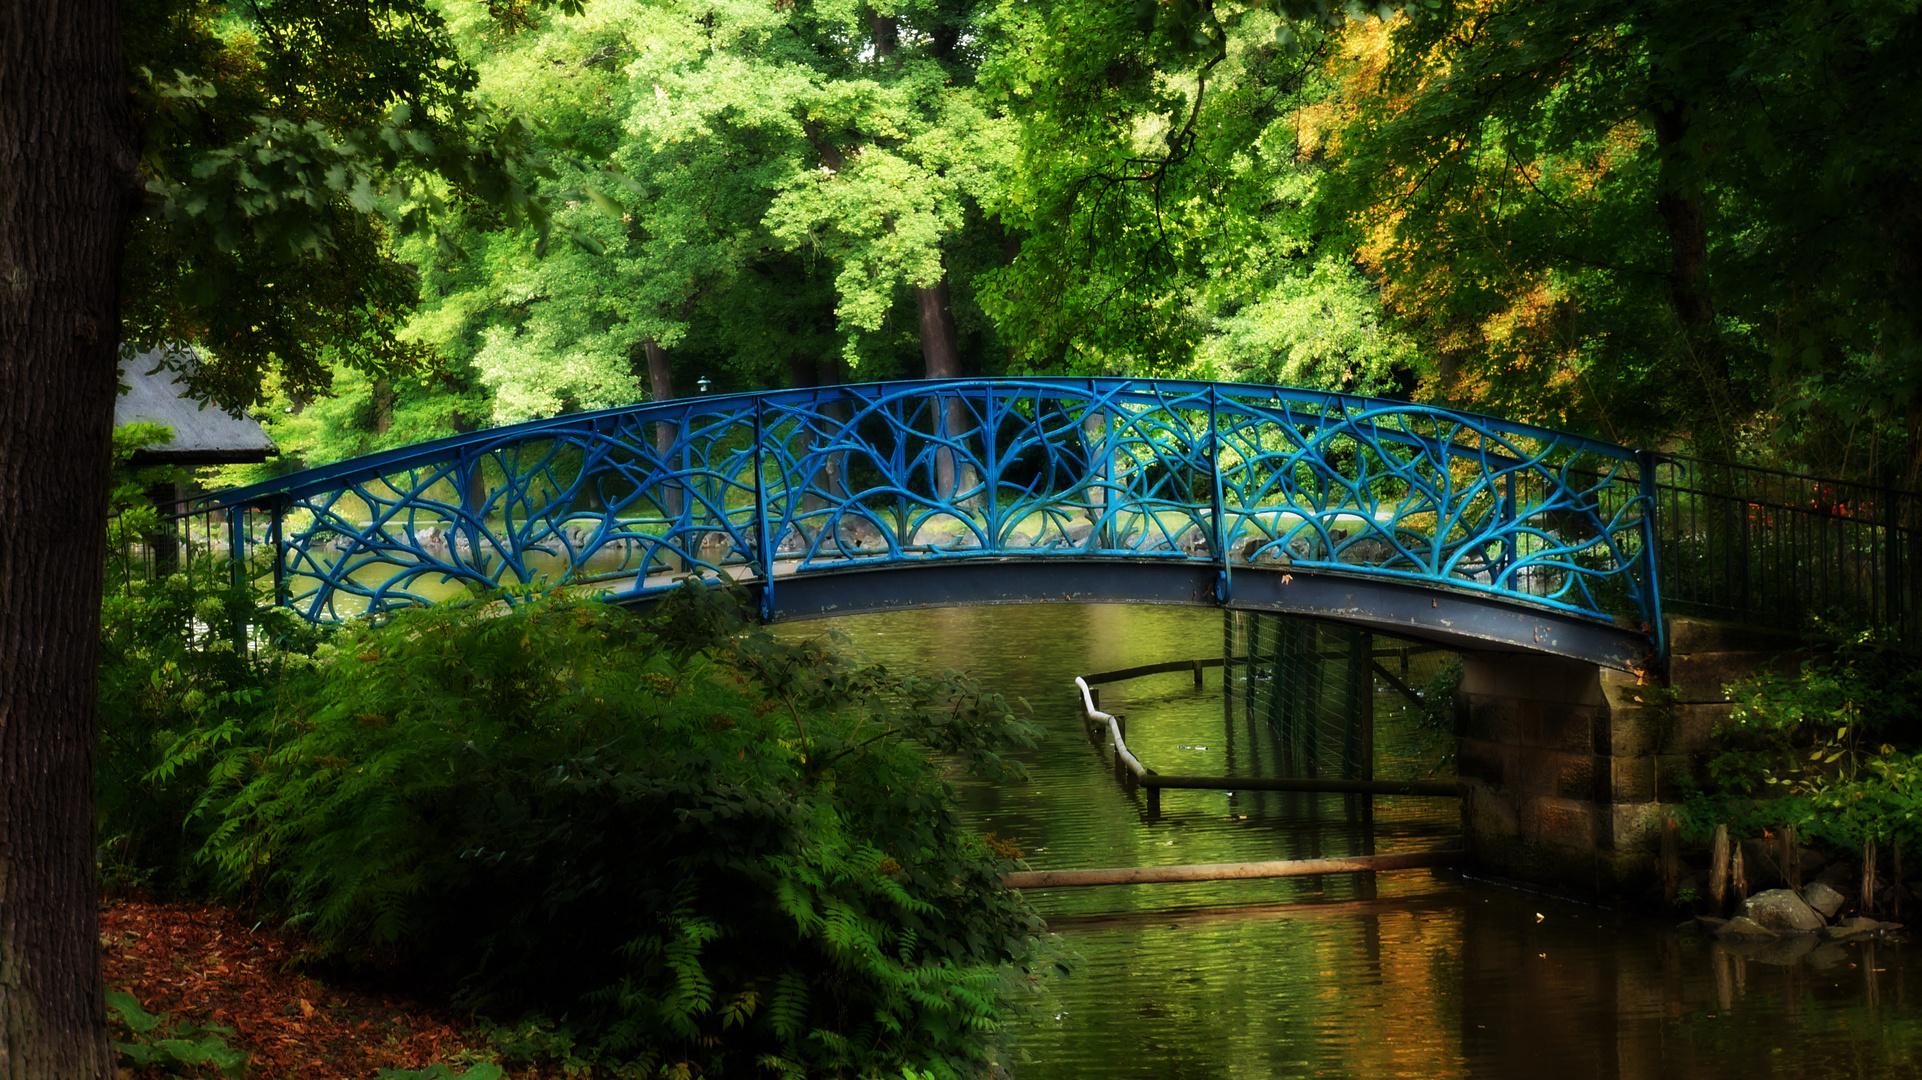 Brücke über den Röhrensee in Bayreuth